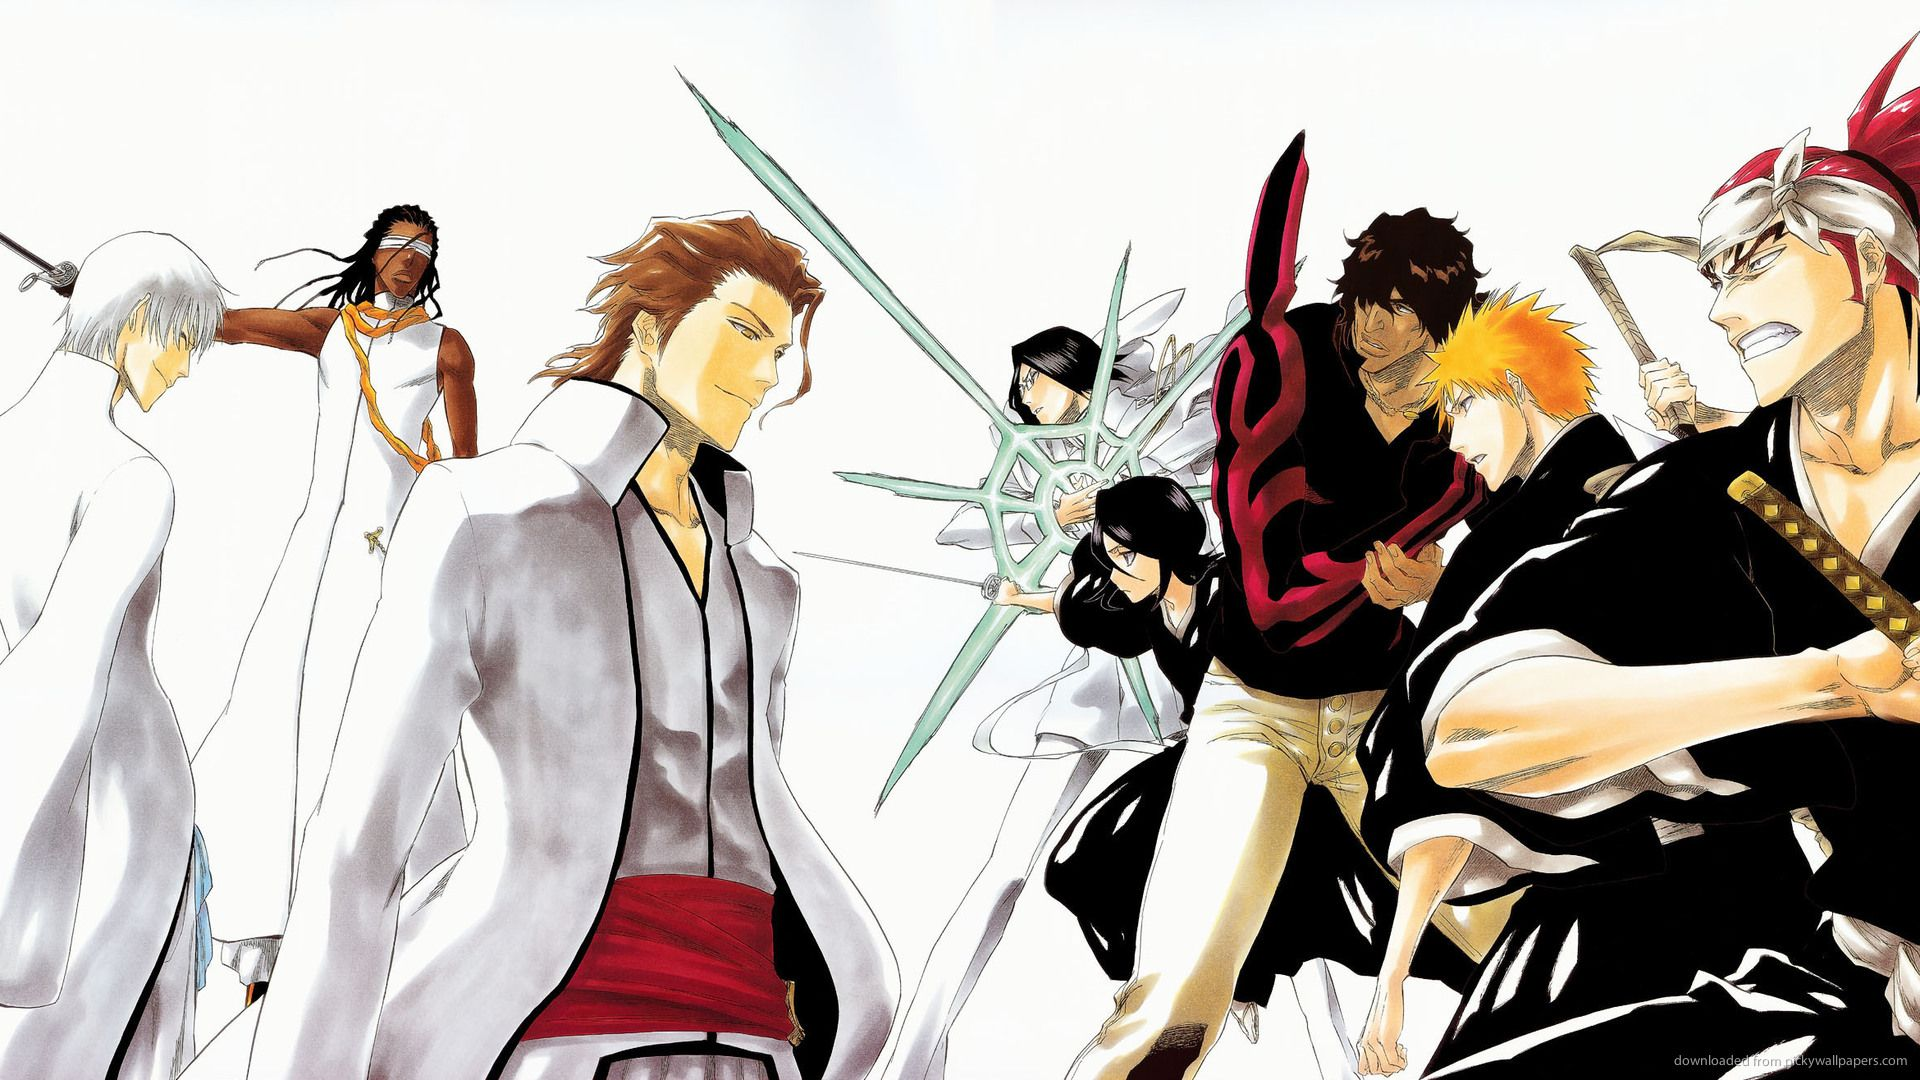 Bleach Renji, Ikaku, Ichigo, Chad &- Uryu | Anime Fan | Pinterest ...